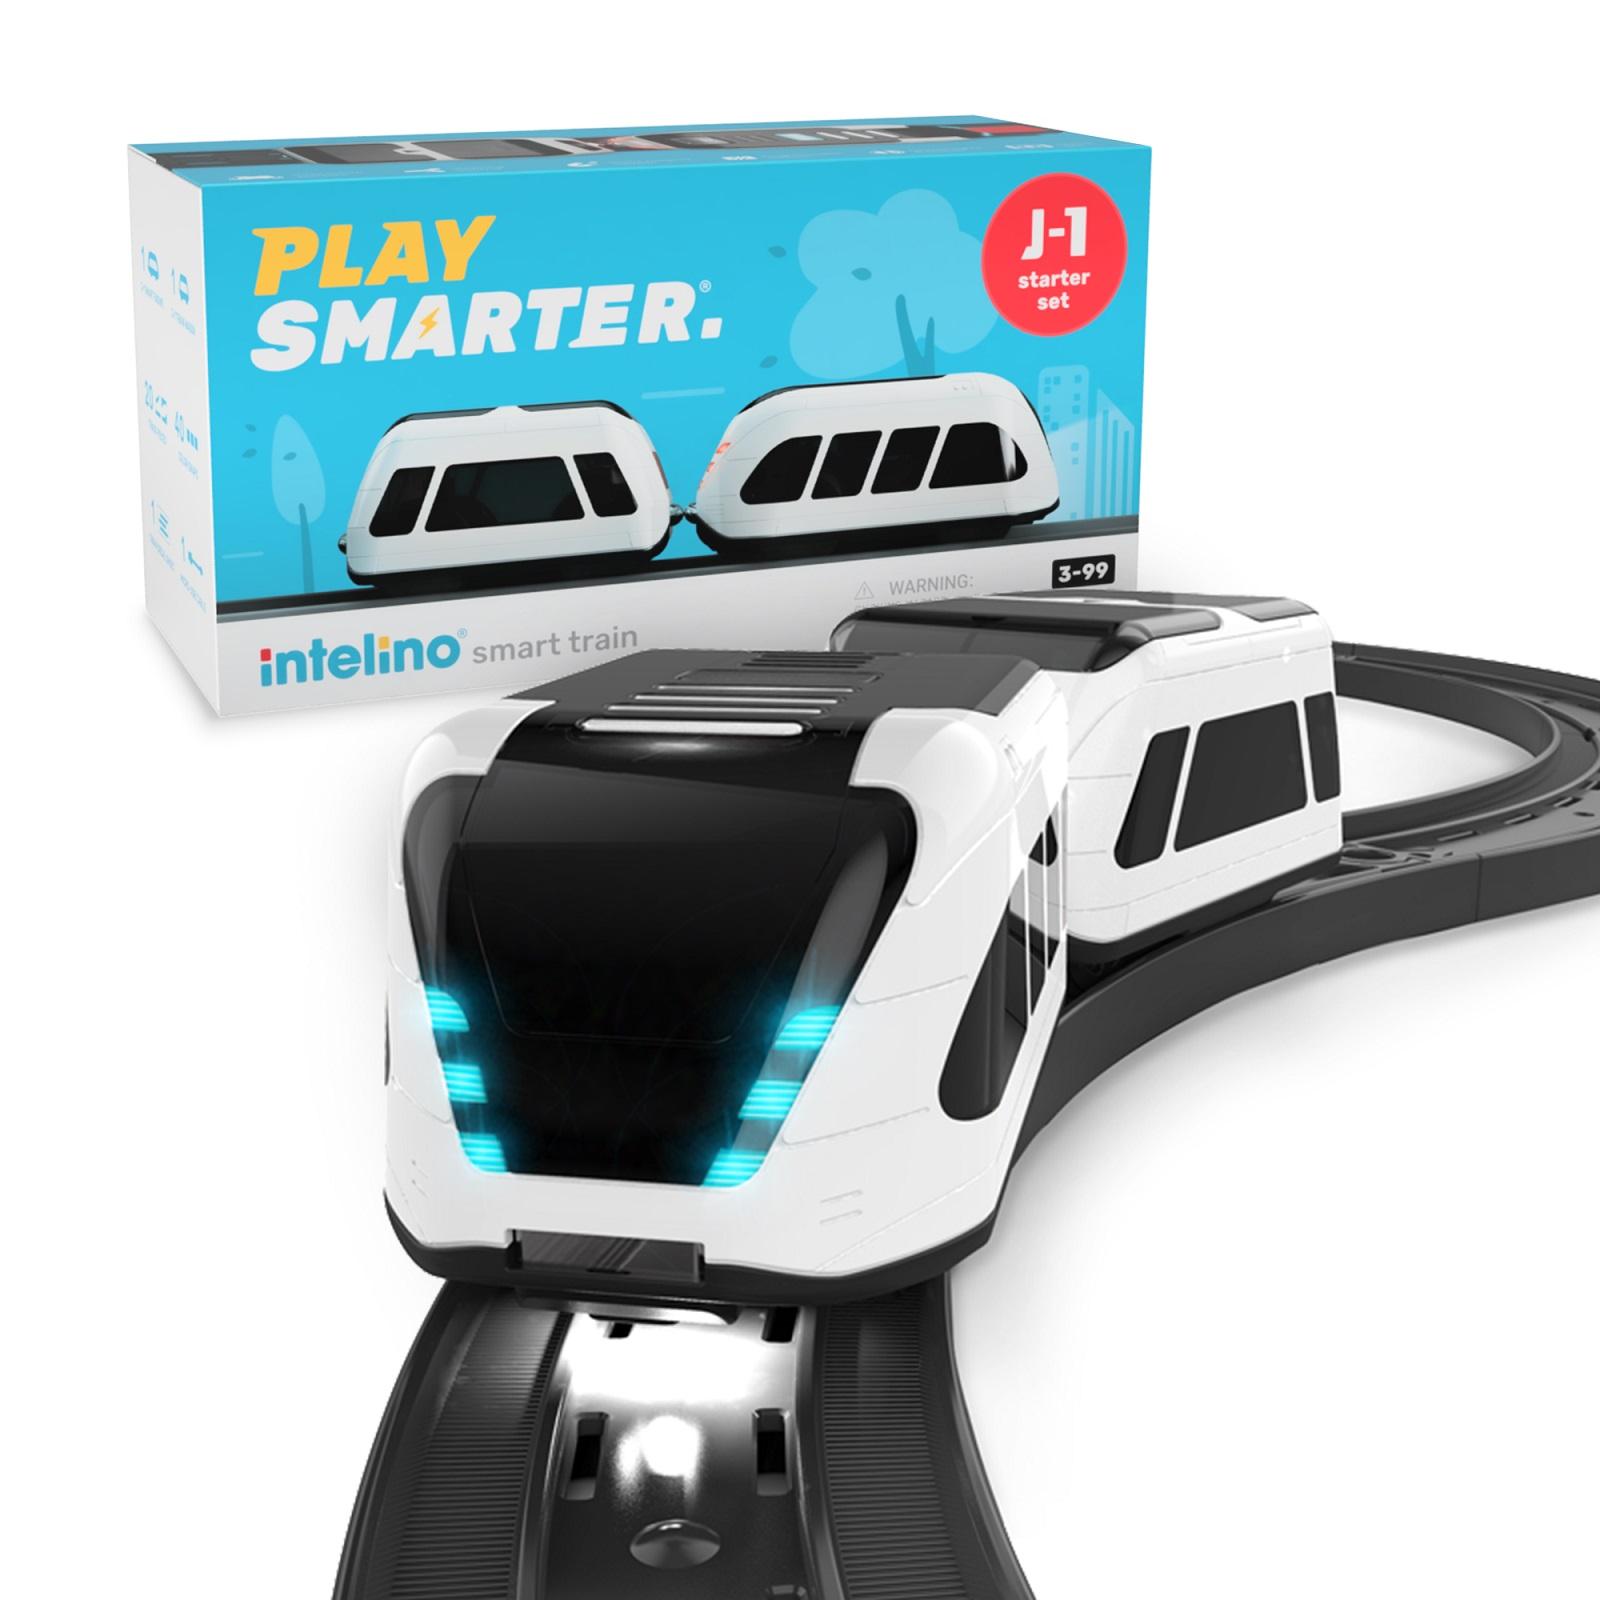 Умная железная дорога Intelino Smart Train J-1 Starter Set White